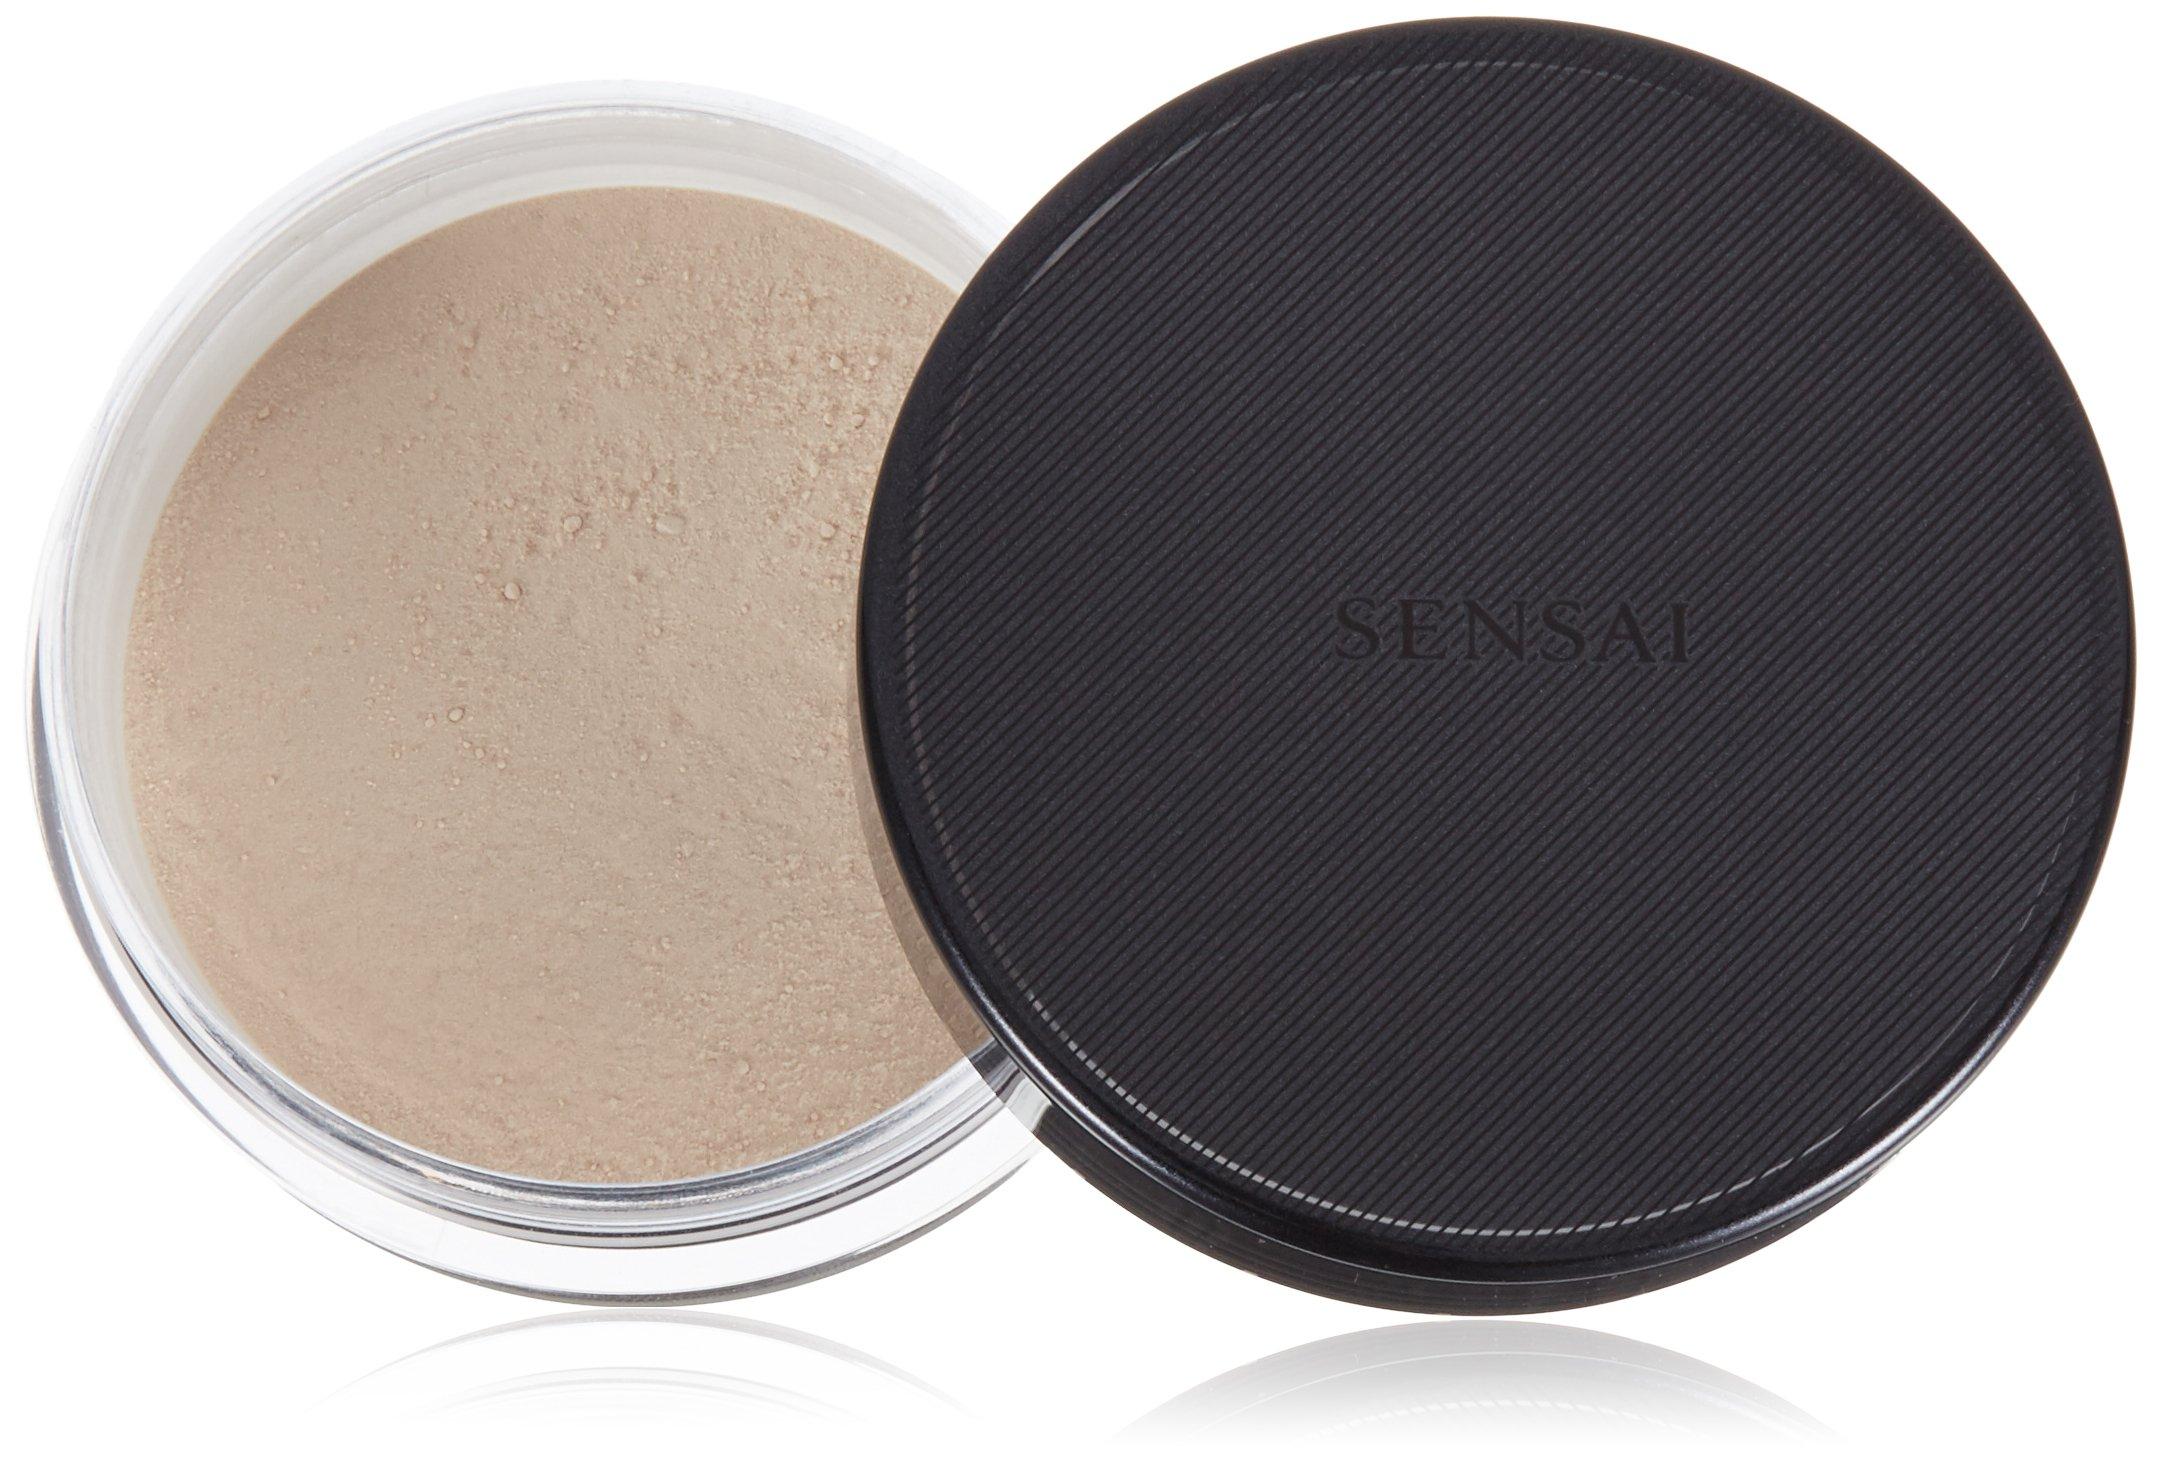 Kanebo Sensai Loose Powder - Translucent 20g/0.7oz